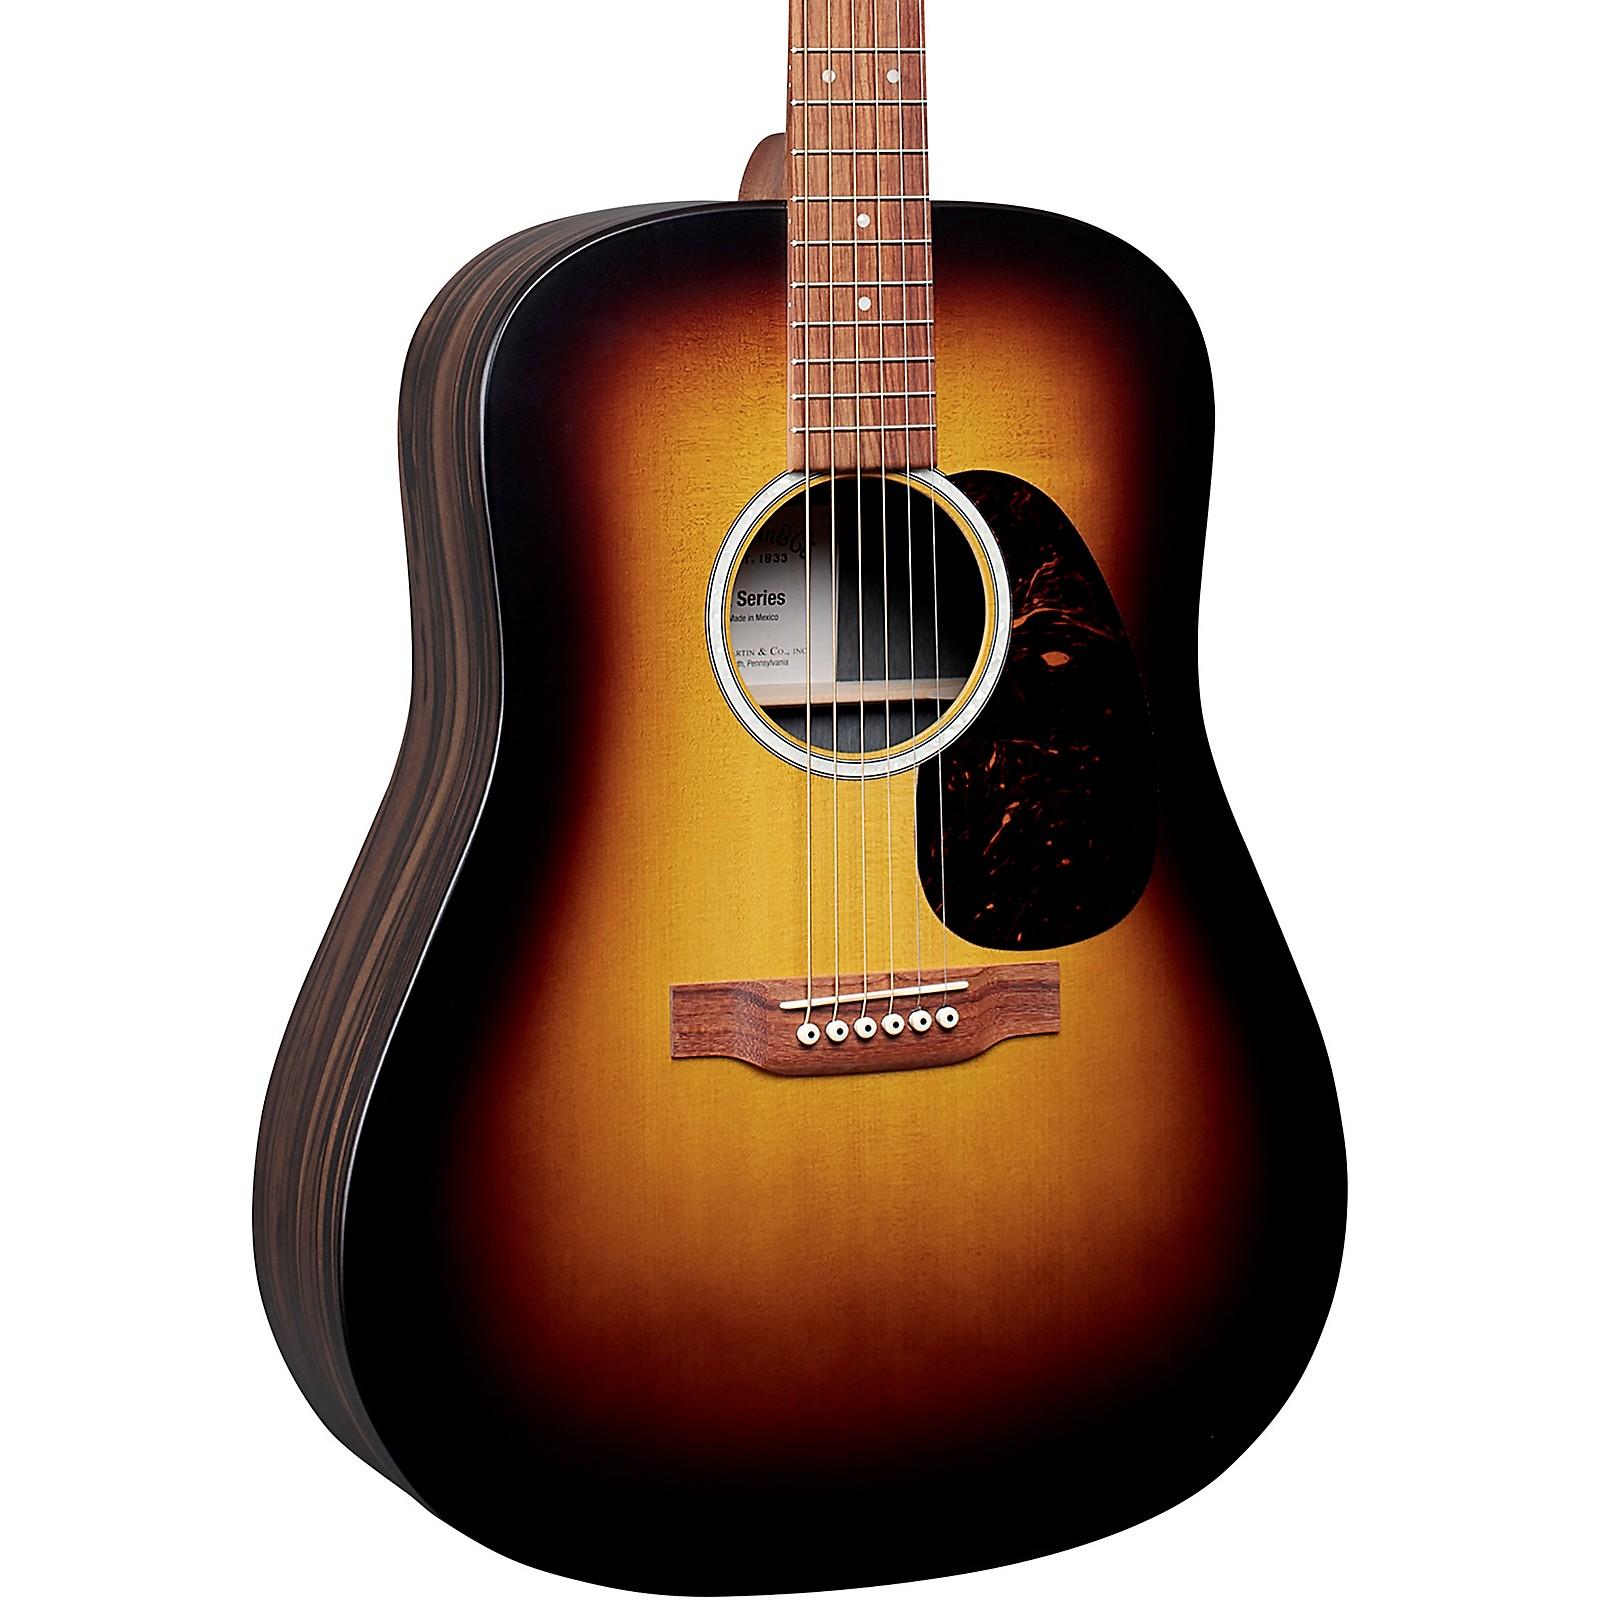 Martin D-X2E Macassar Ebony Sunburst Dreadnought Acoustic-Electric Guitar